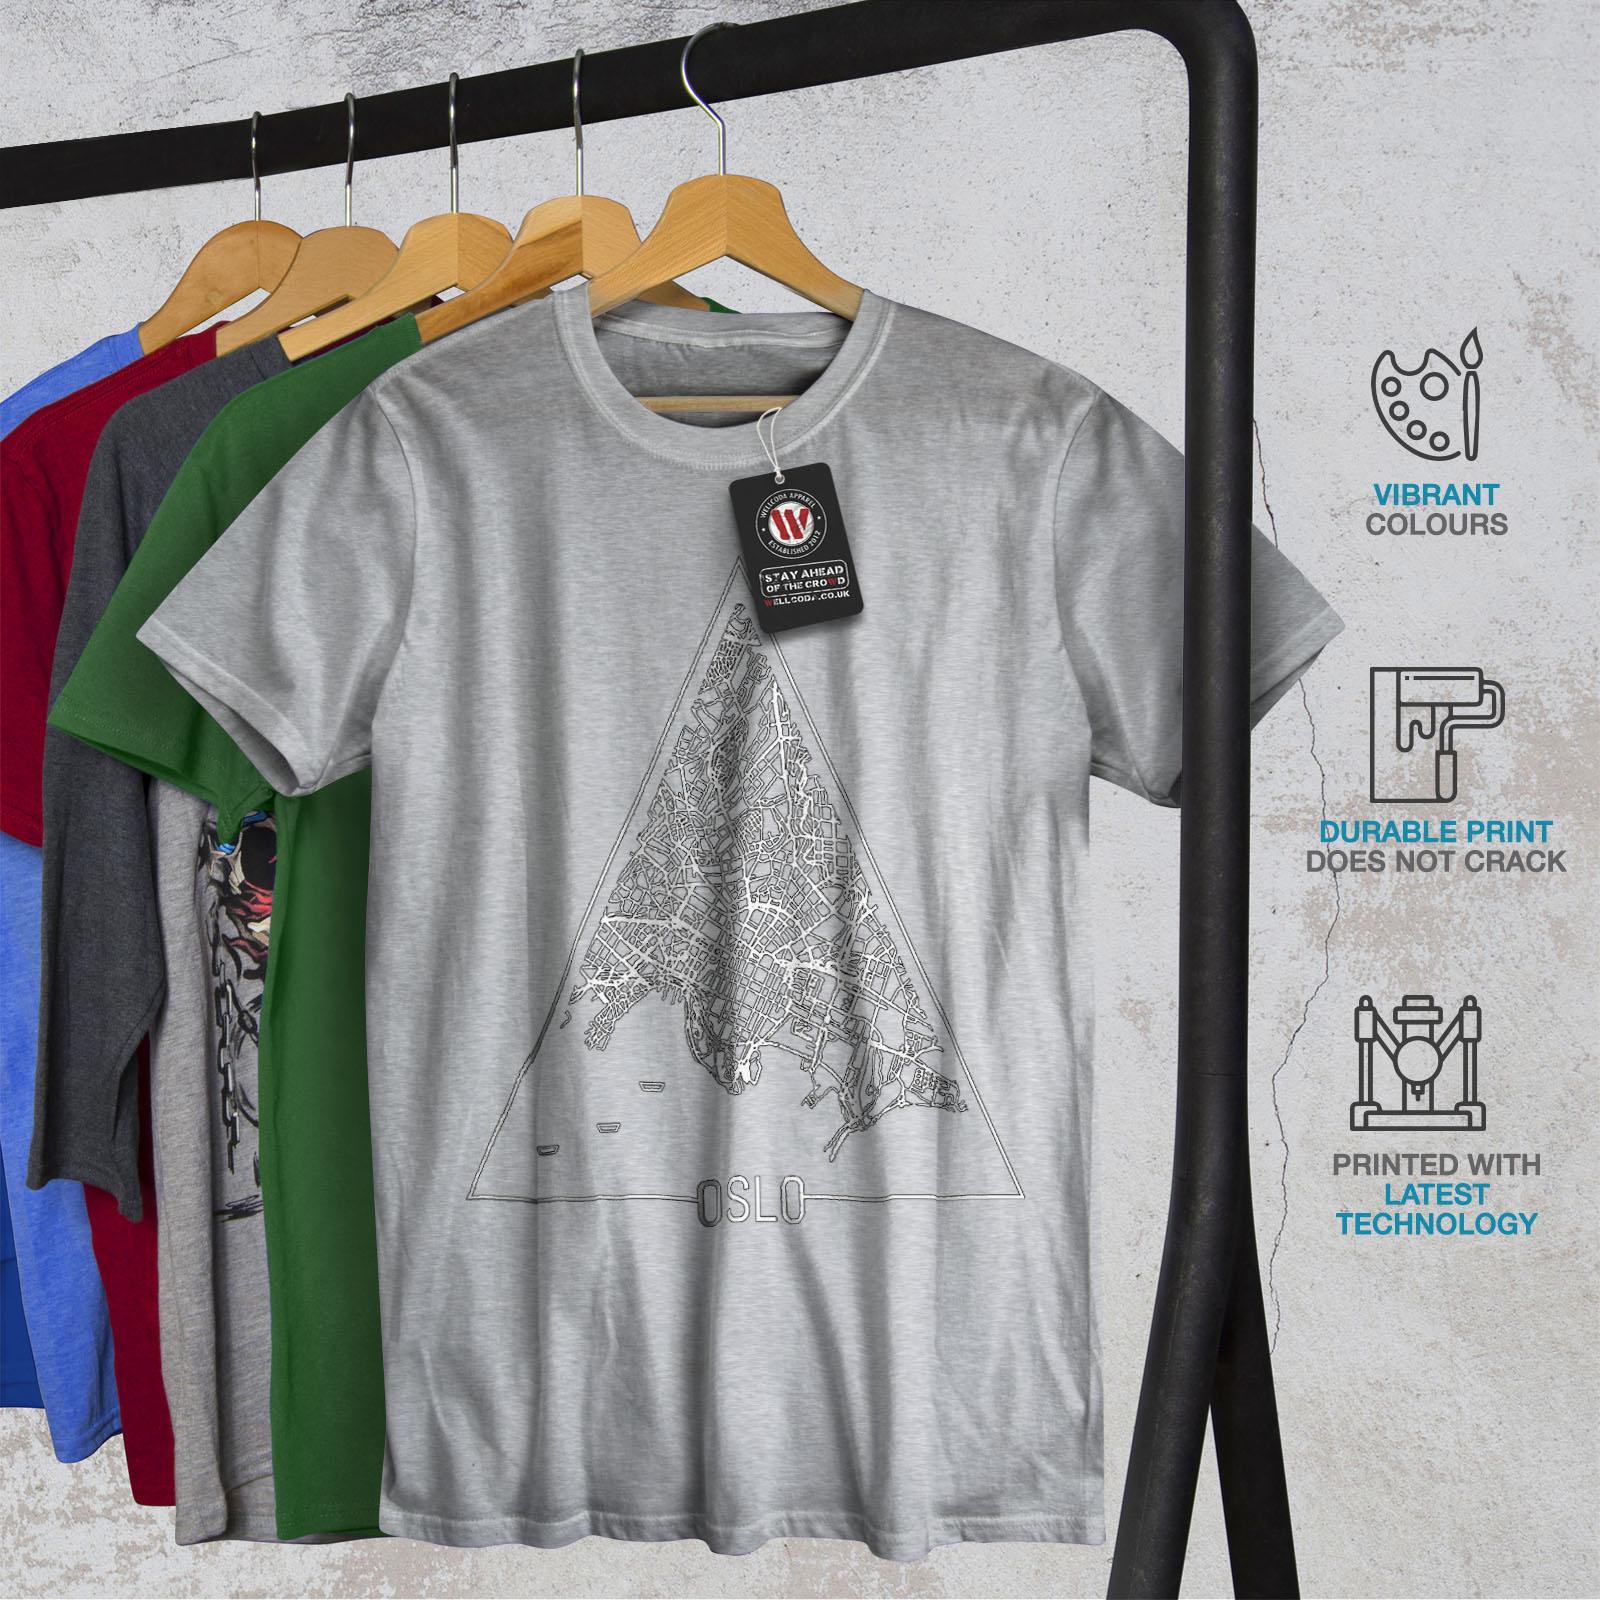 Wellcoda-Norvegia-Big-City-Oslo-da-uomo-T-shirt-Citta-design-grafico-stampato-T-shirt miniatura 18